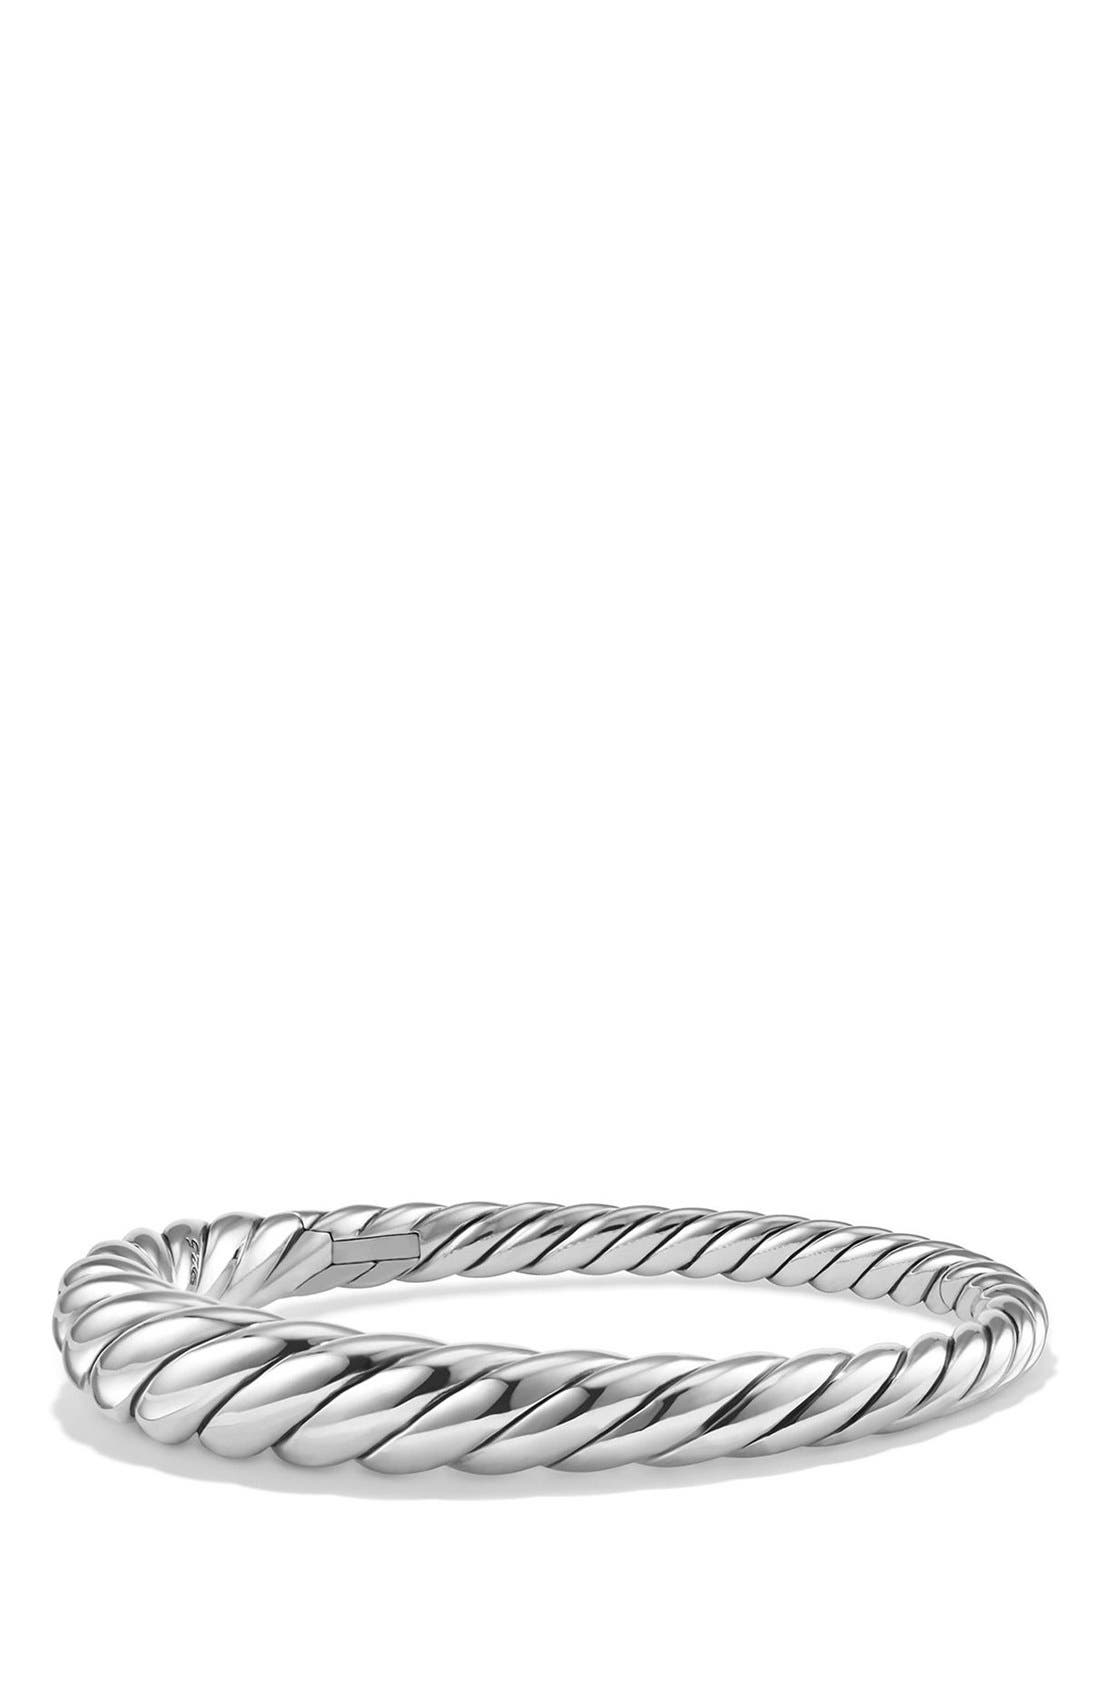 DAVID YURMAN 'Pure Form' Small Cable Bracelet, Main, color, SILVER